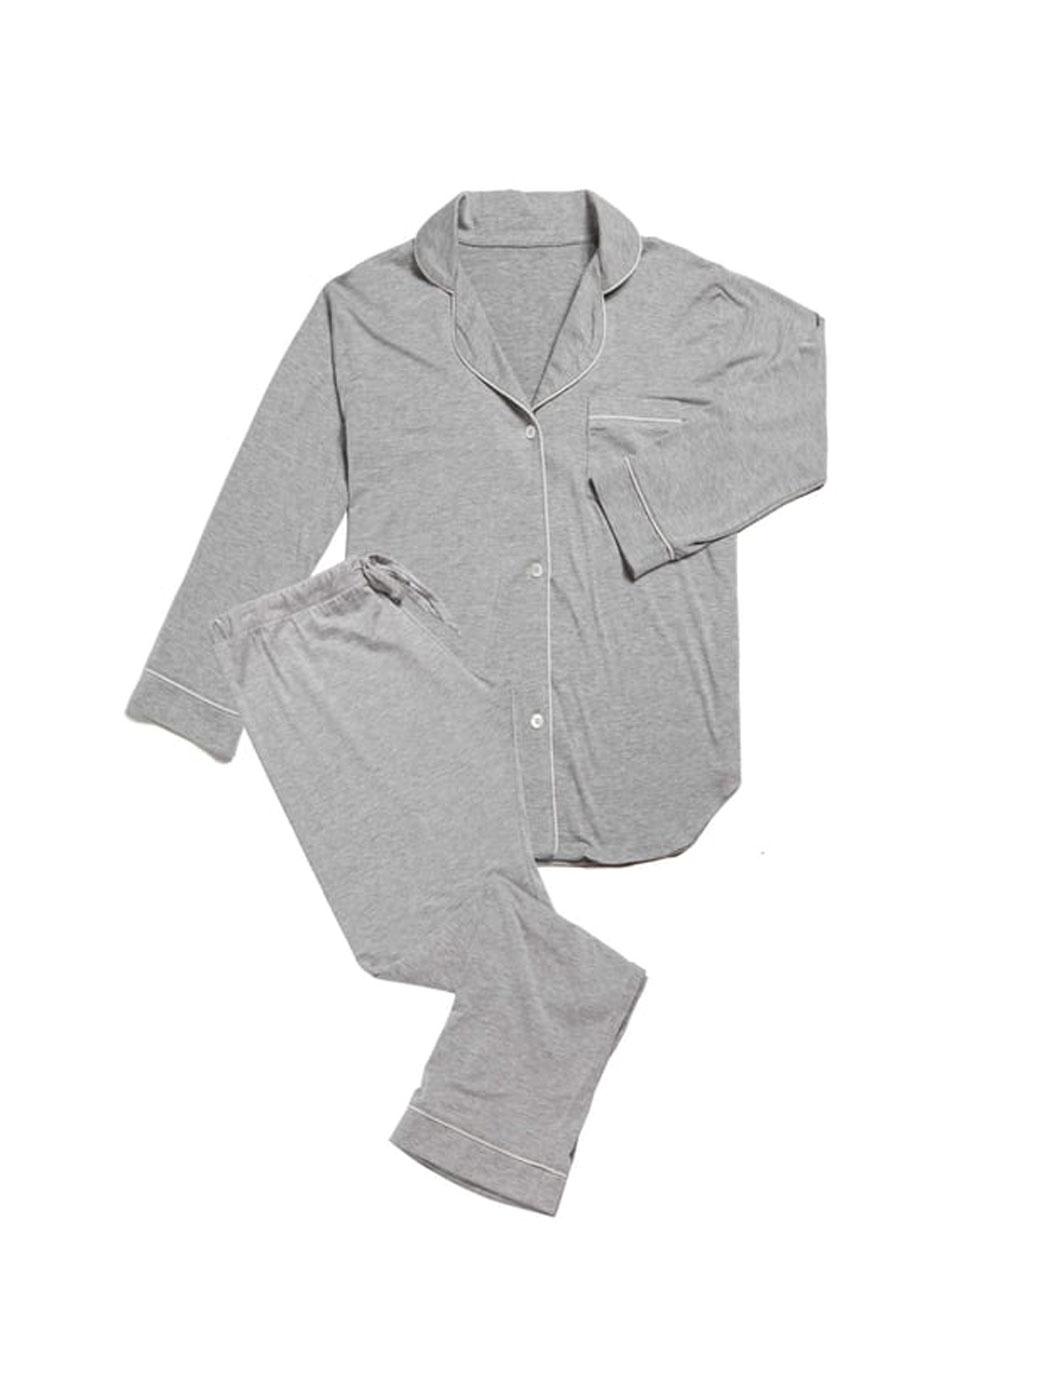 MARIGOT Women s Grey Lurin Long Pajama Set Sz S  155 NEW 086260096